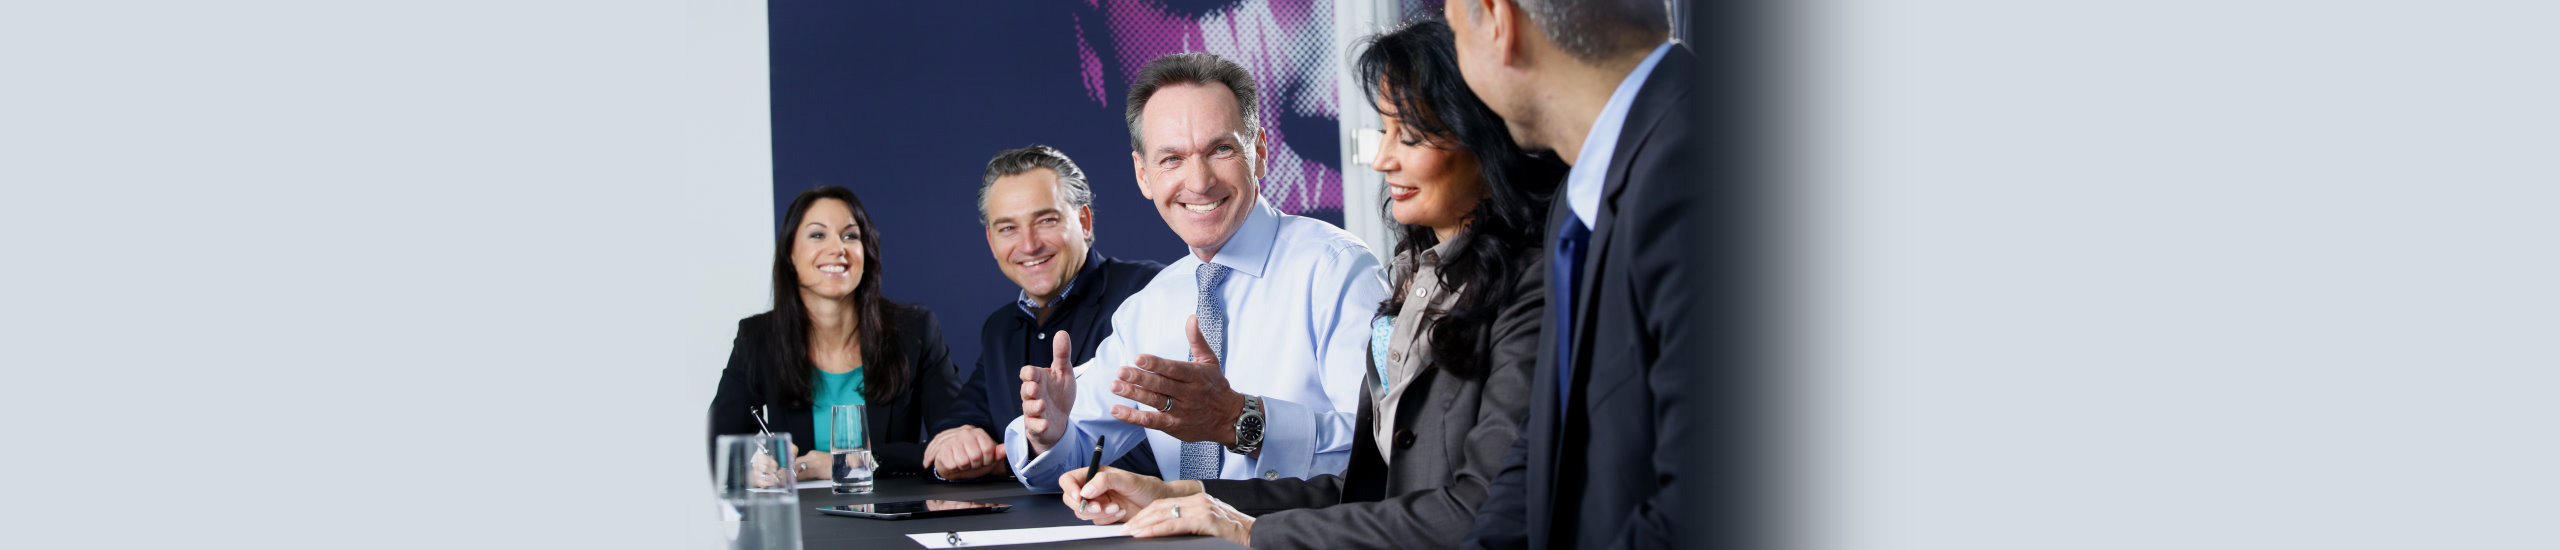 Besprechung zur Neukundengewinnung & Vertriebsunterstützung mit Mumme & Partner